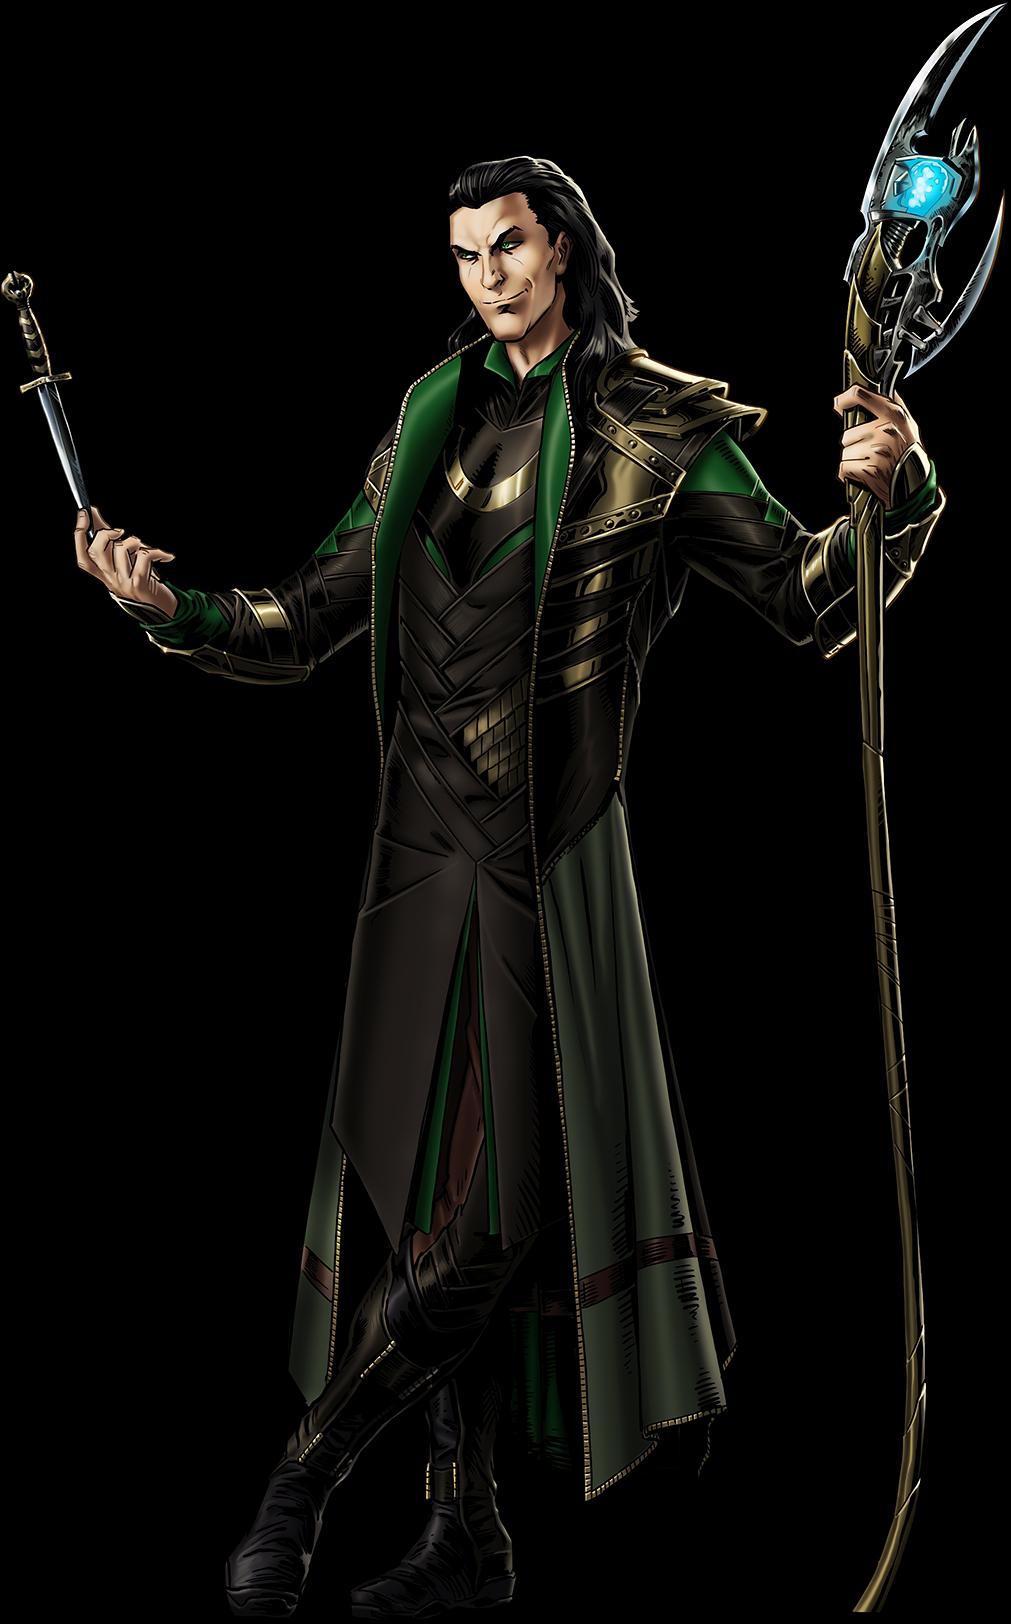 Image - Loki Right Portrait Art.png   Marvel: Avengers Alliance Wiki    FANDOM powered by Wikia - Loki PNG